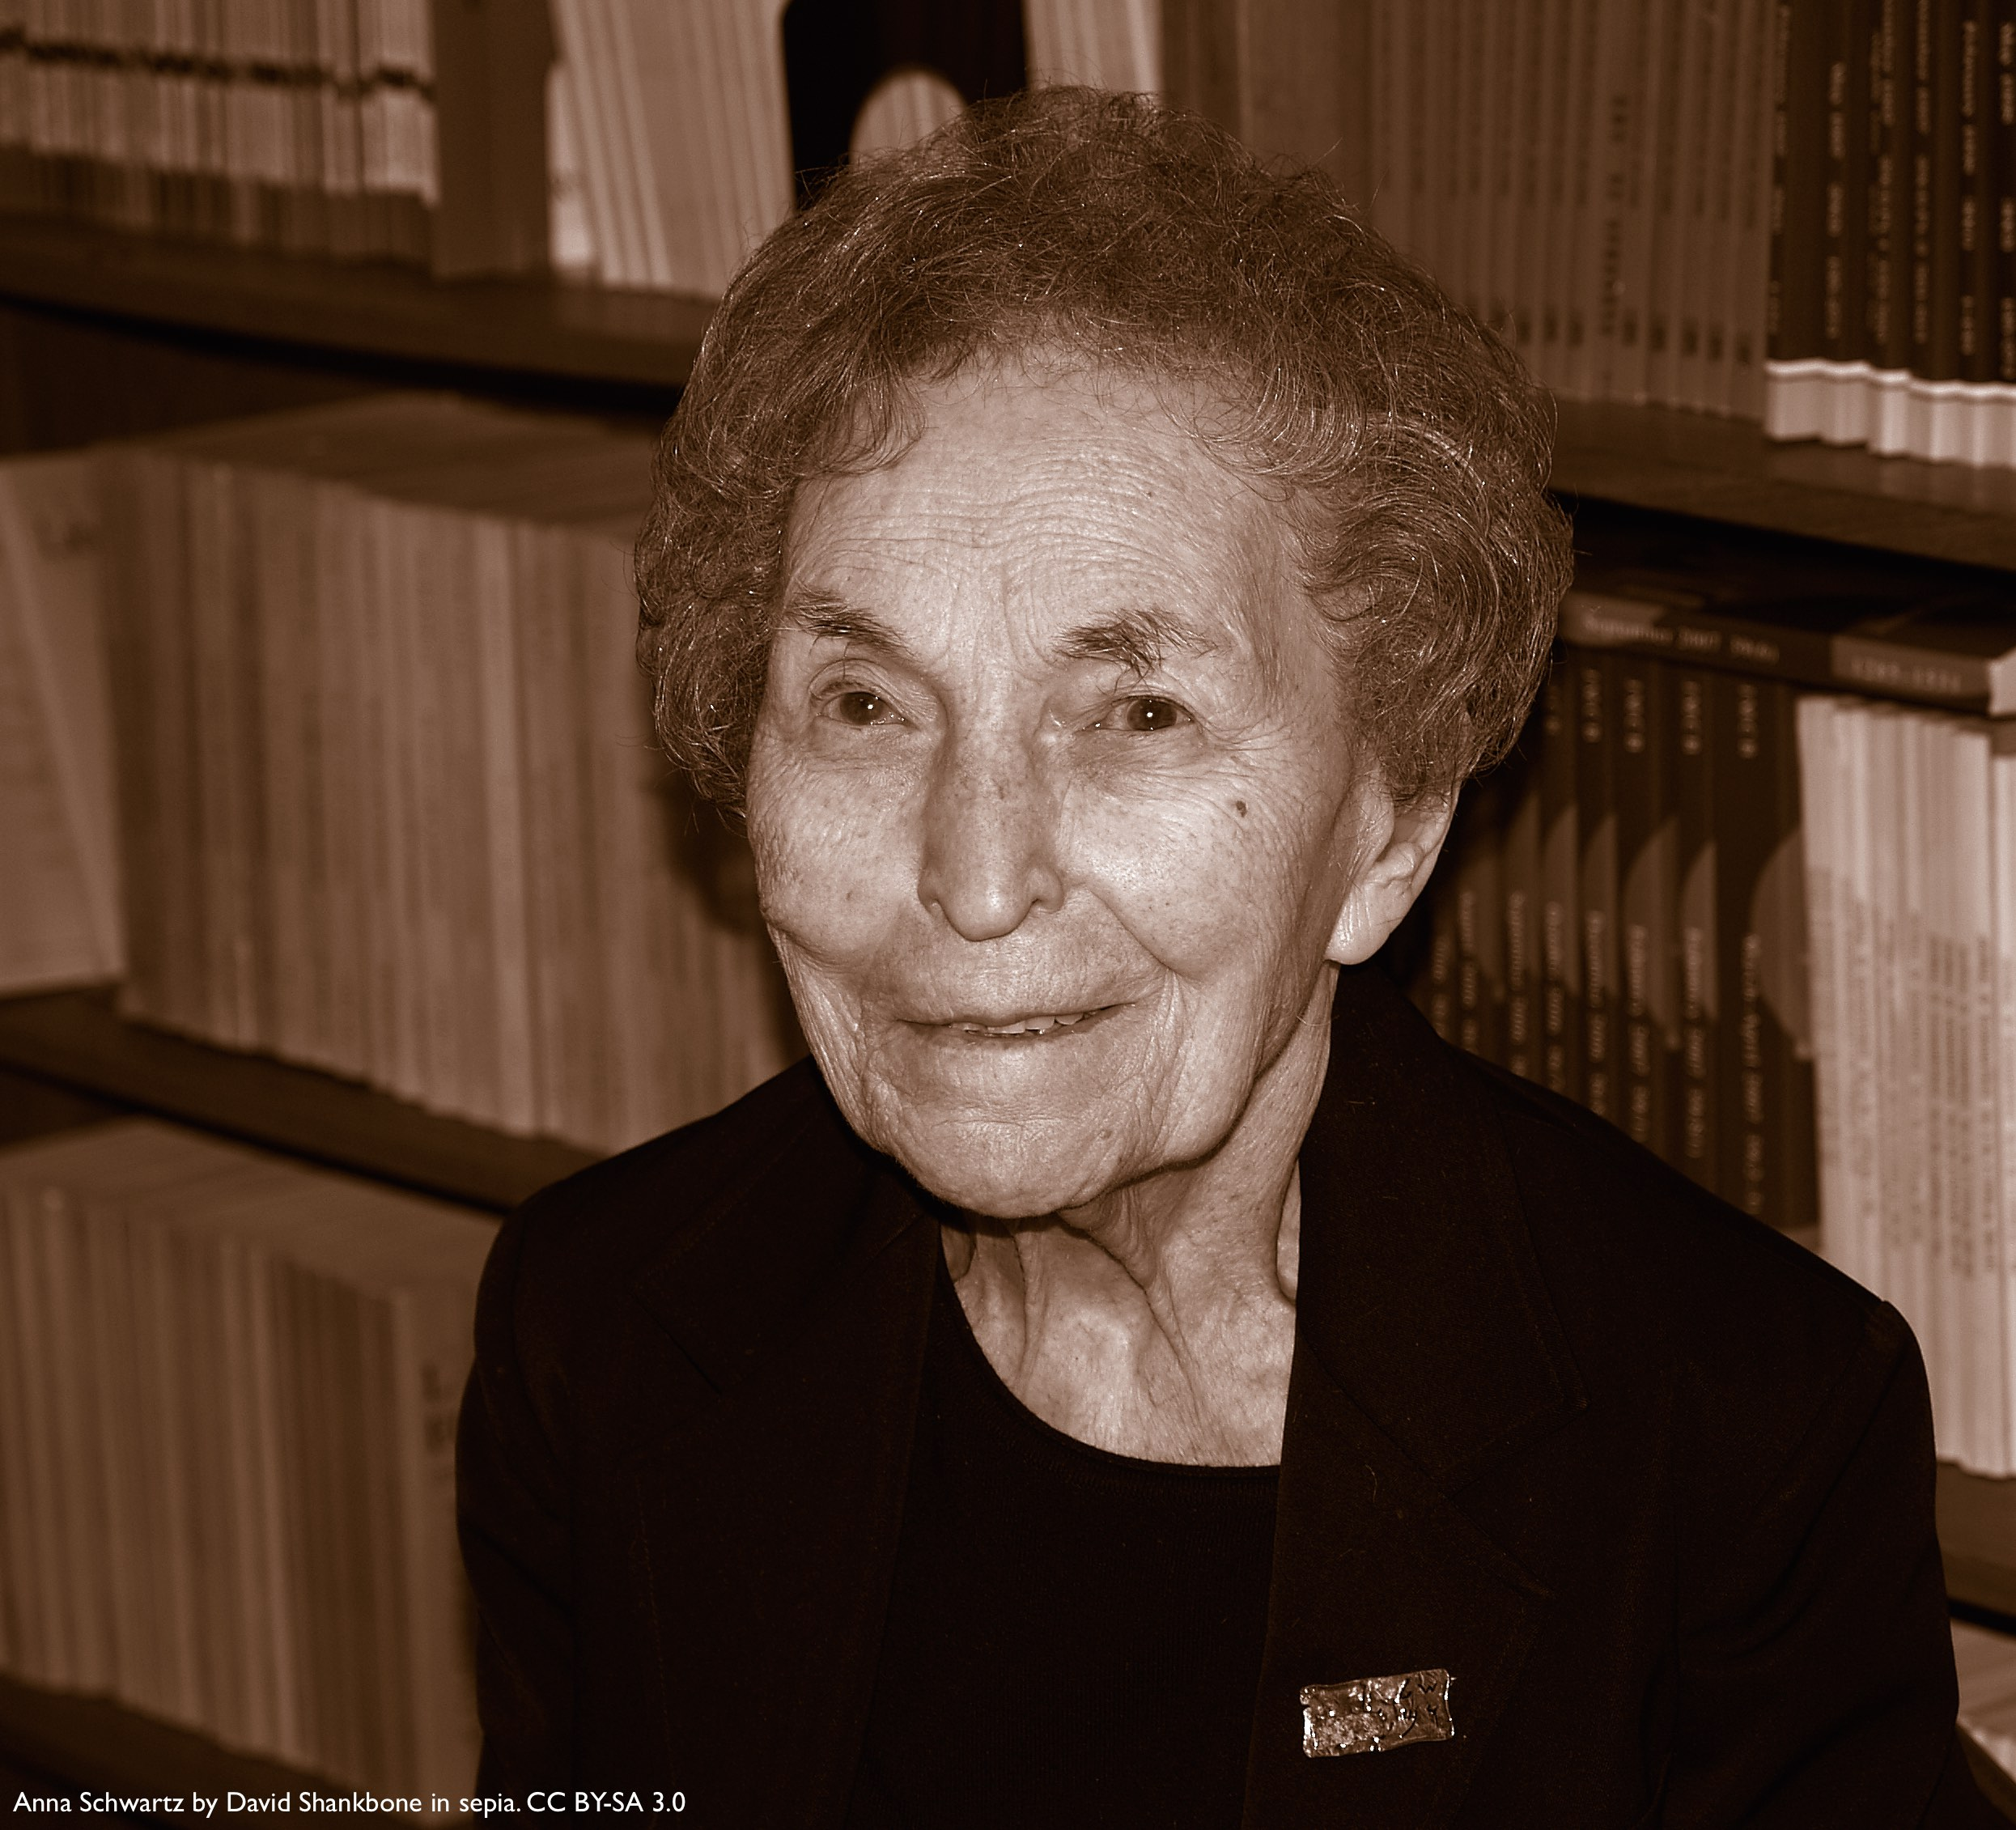 nna Schwartz, memoriam, birthday, economist, monetary